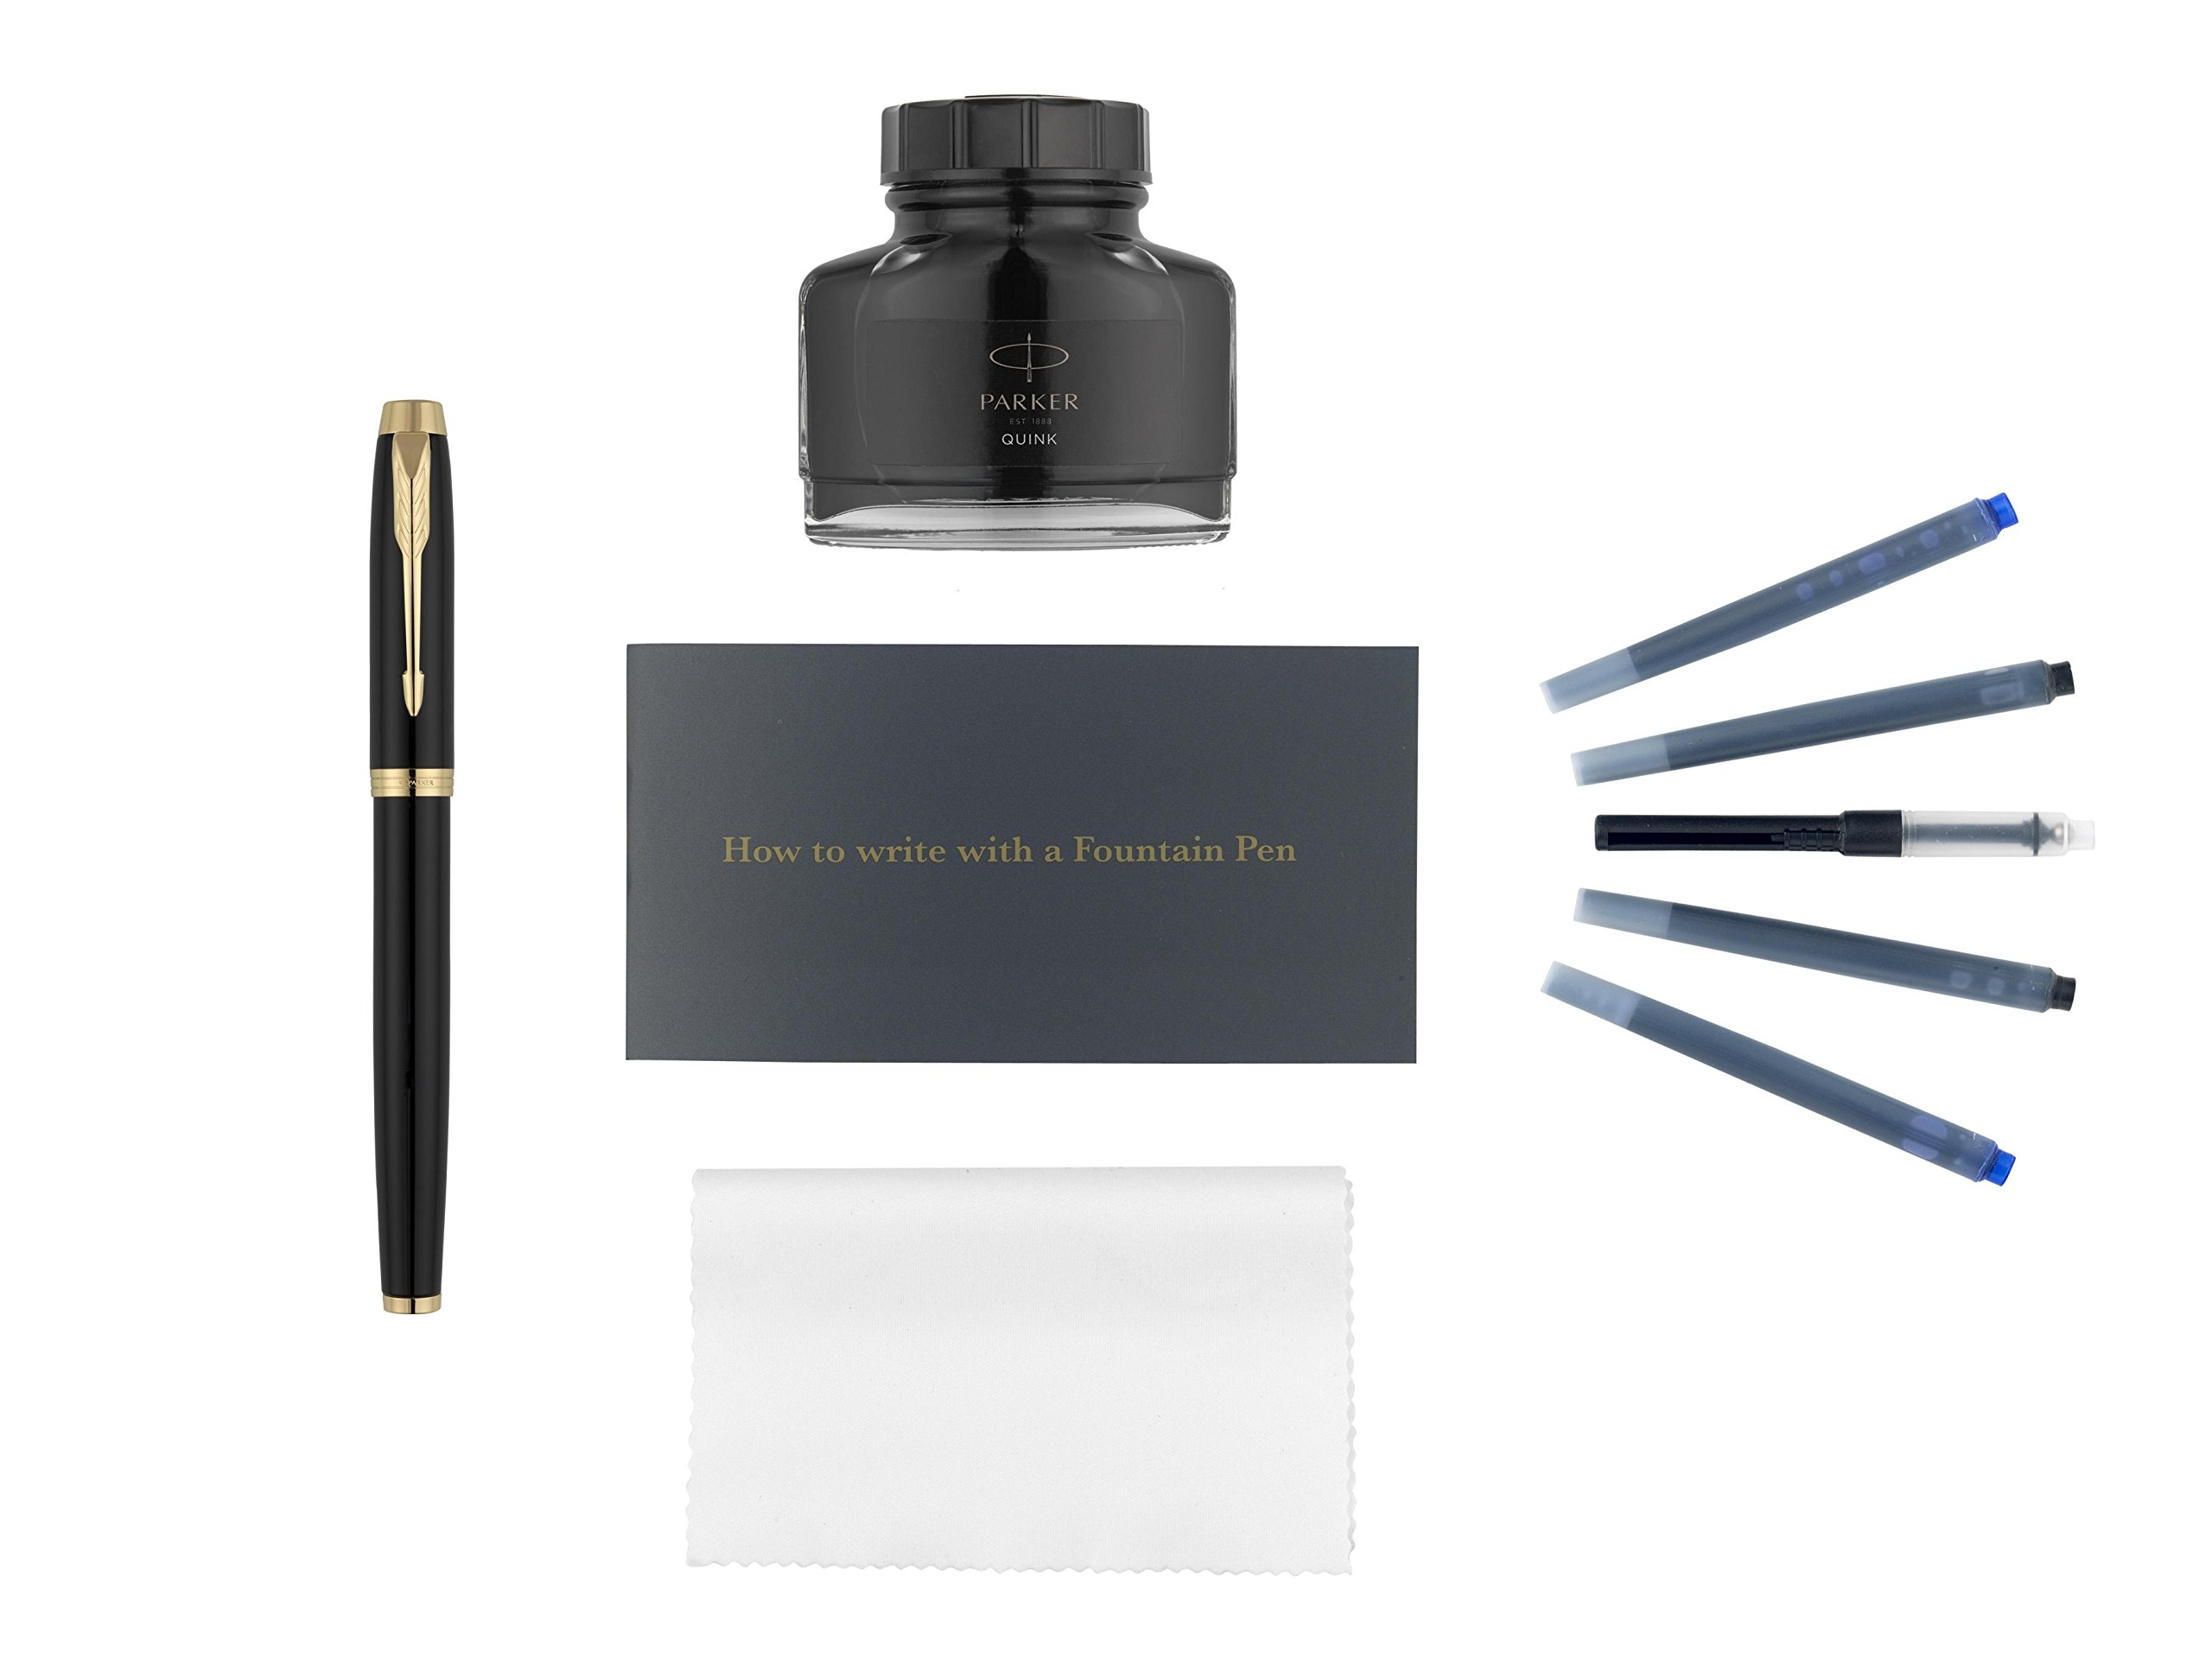 Parker IM Fountain Pen Kit, Black Lacquer with Gold Trim, Ink Bottle Refill, Ink Cartridge Refills, Ink Bottle Converter